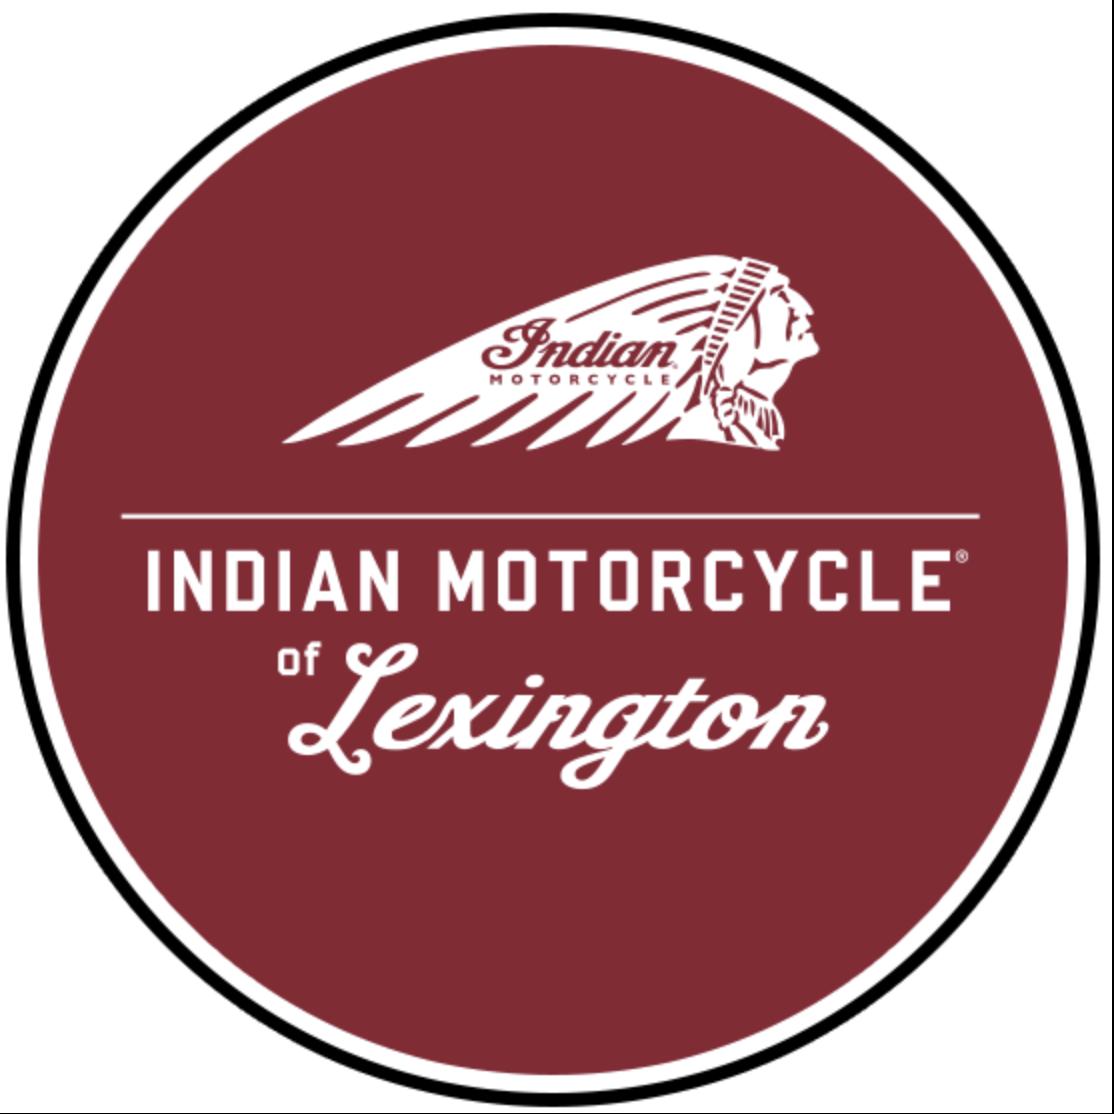 Indian Motorcycle of Lexington